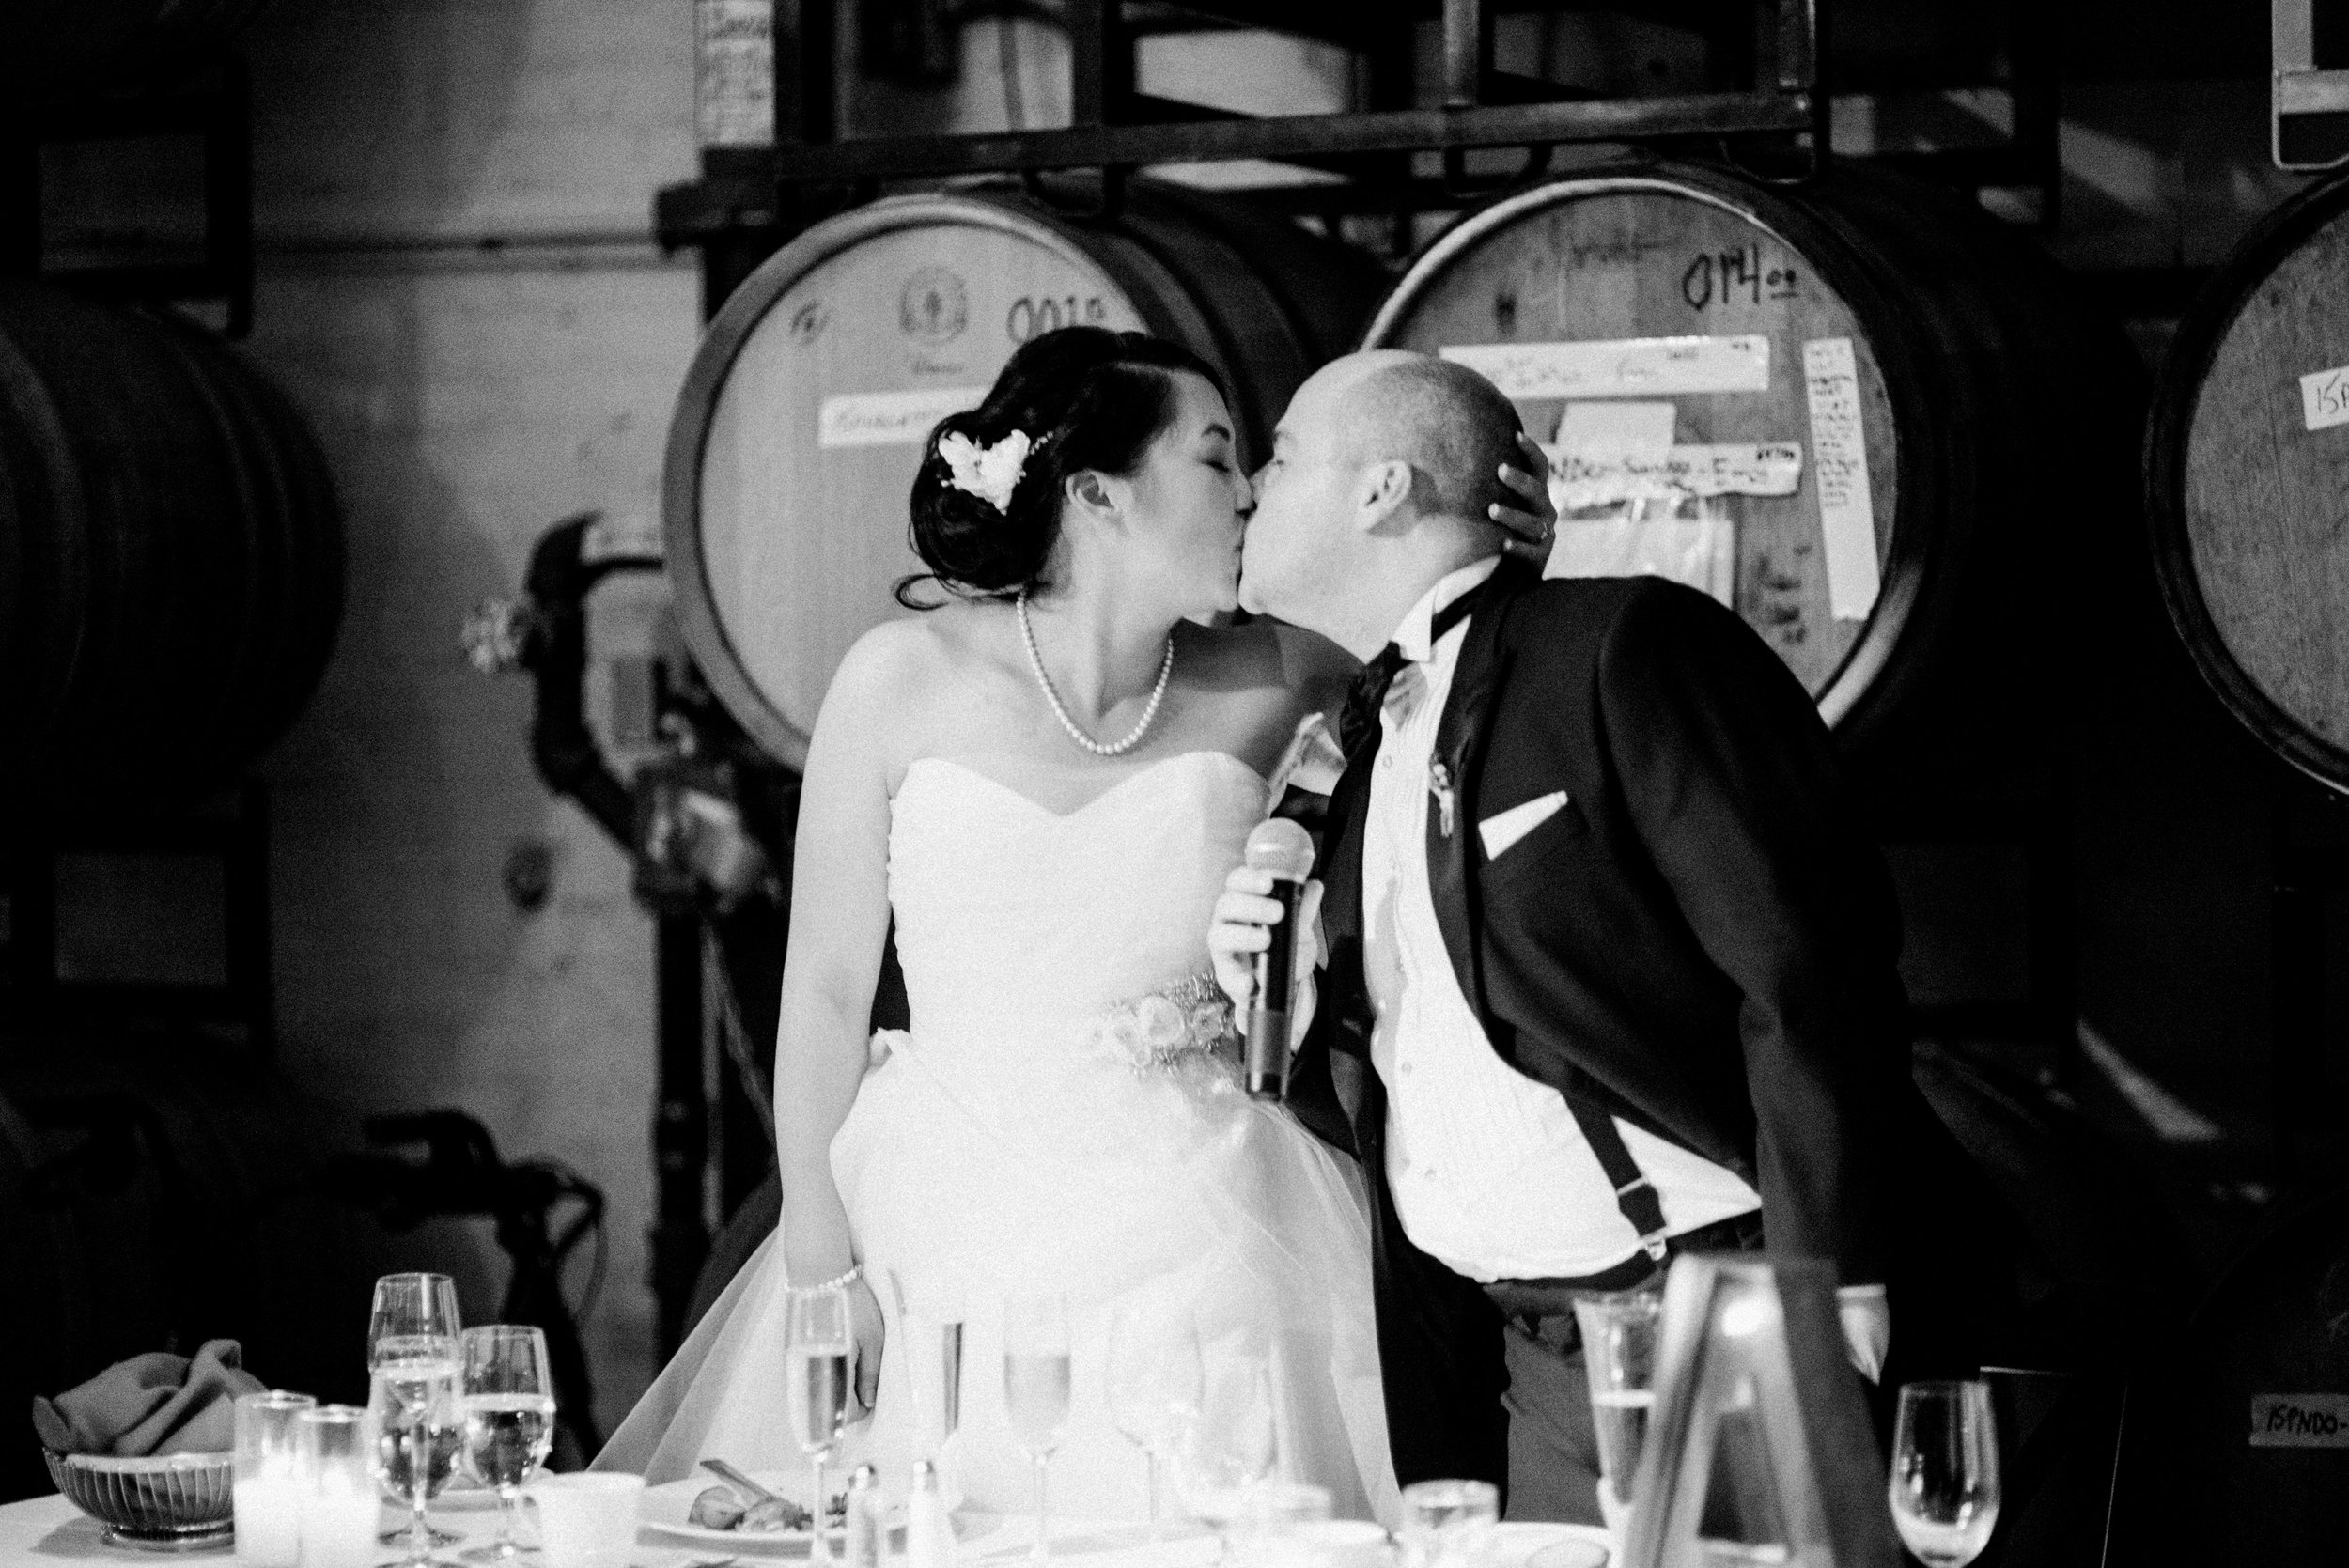 Swedenborgian Church Dogpatch Winery Wedding085.jpg